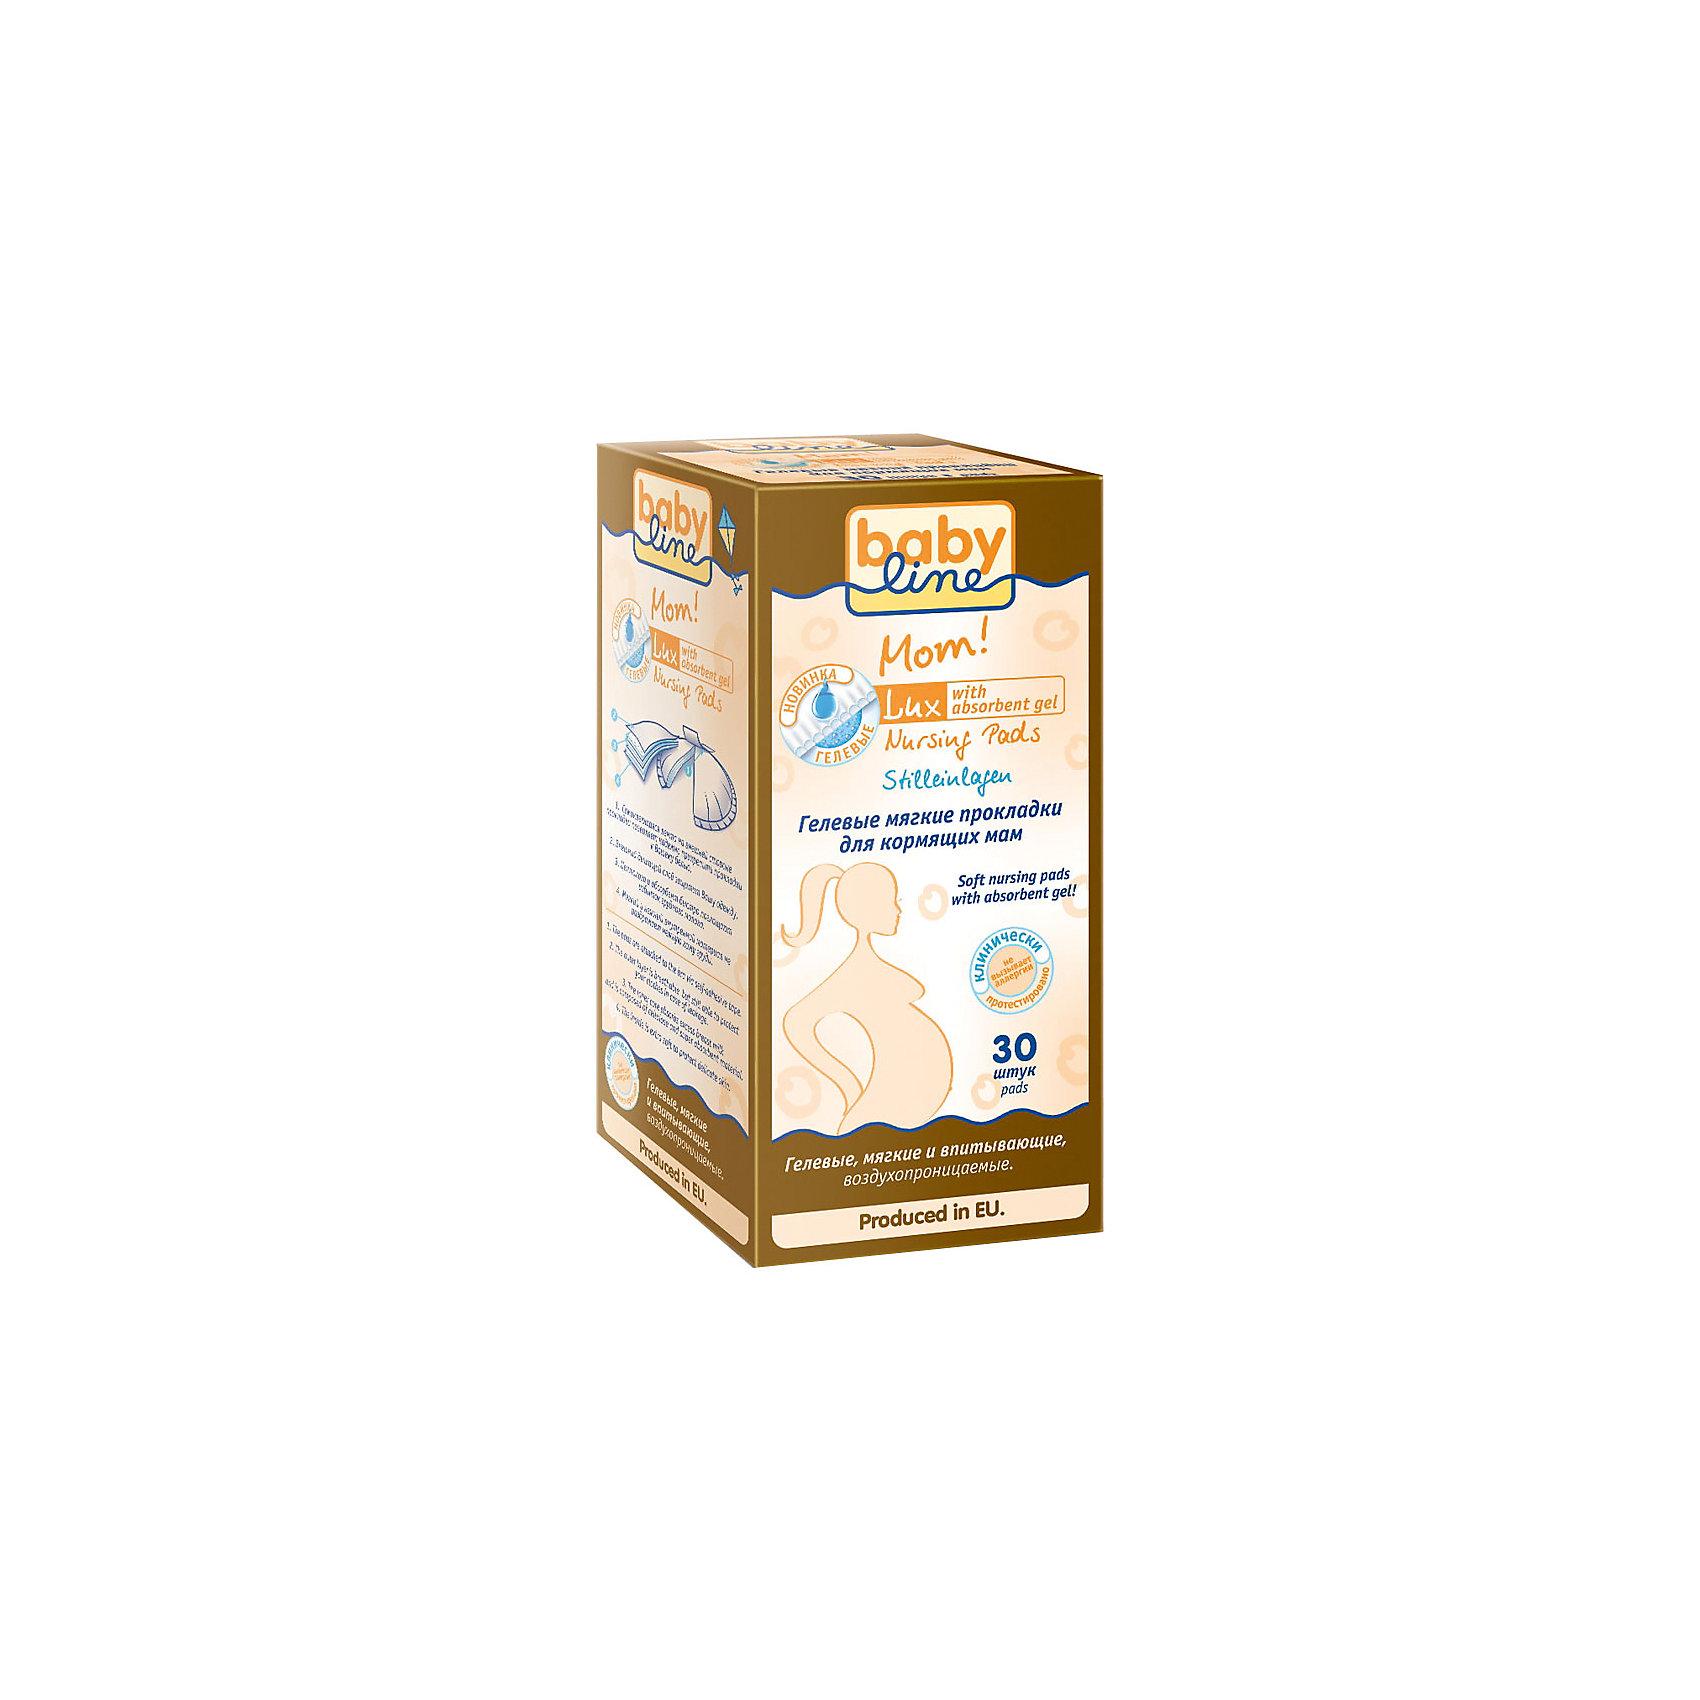 Гелевые прокладки для груди LUX , 30 шт., BabyLine (Babyline)